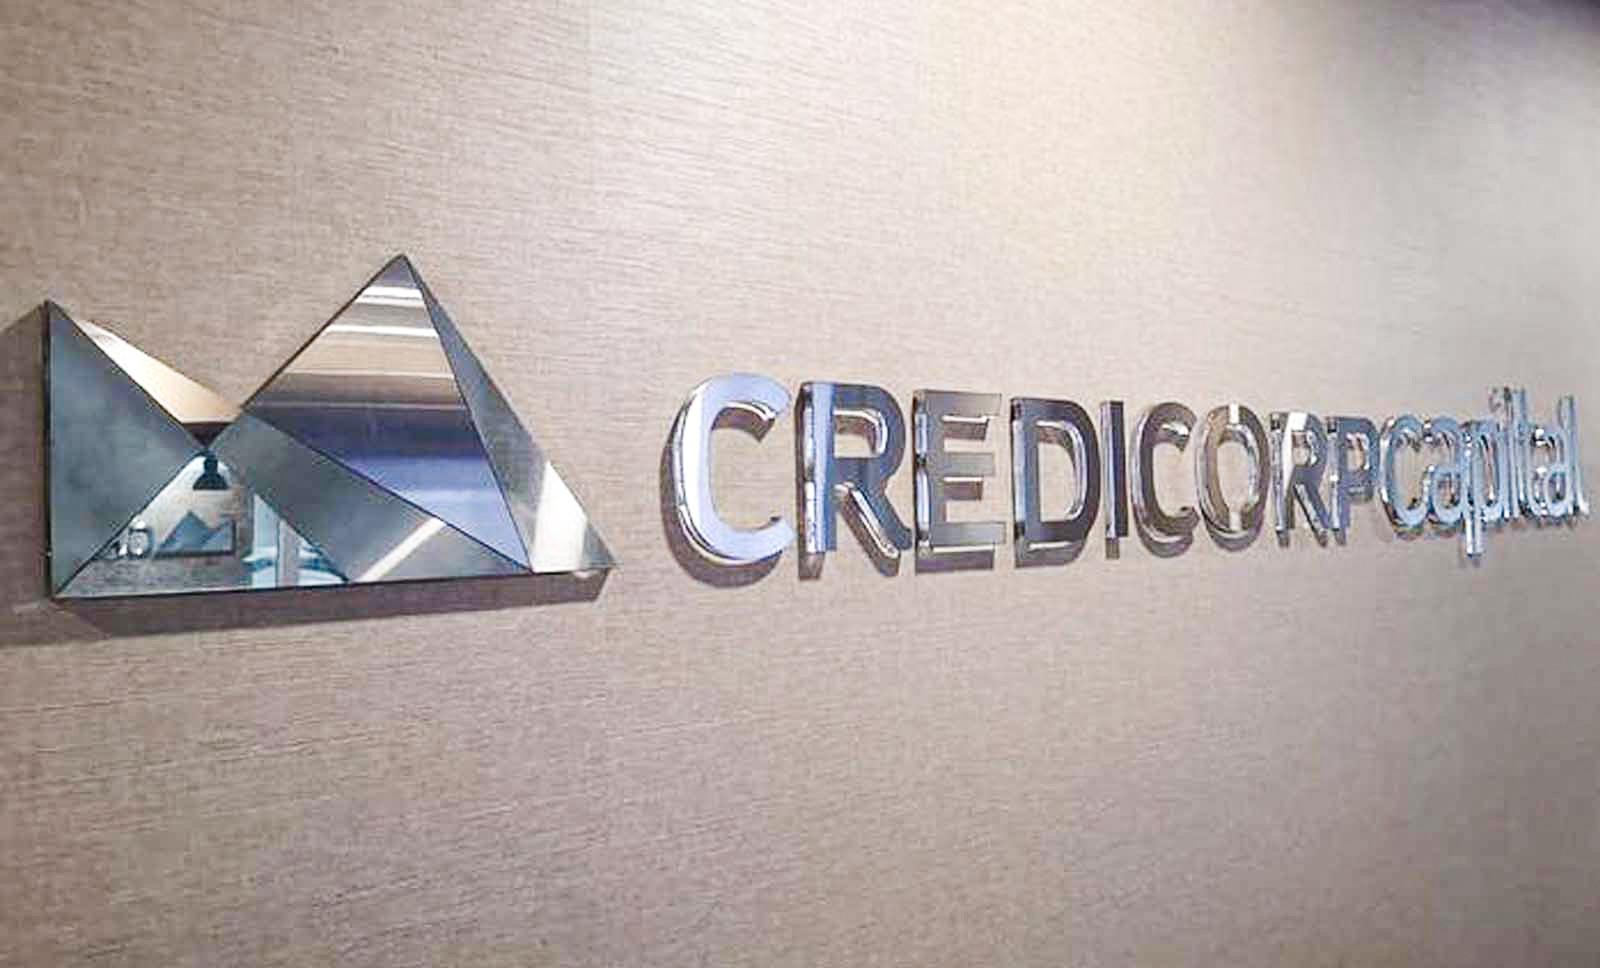 credicorp-capital-pbi-local-seria-de-7-en-2021-pero-no-bastaria-para-reducir-el-deficit-fiscal-asumido-por-covid-19